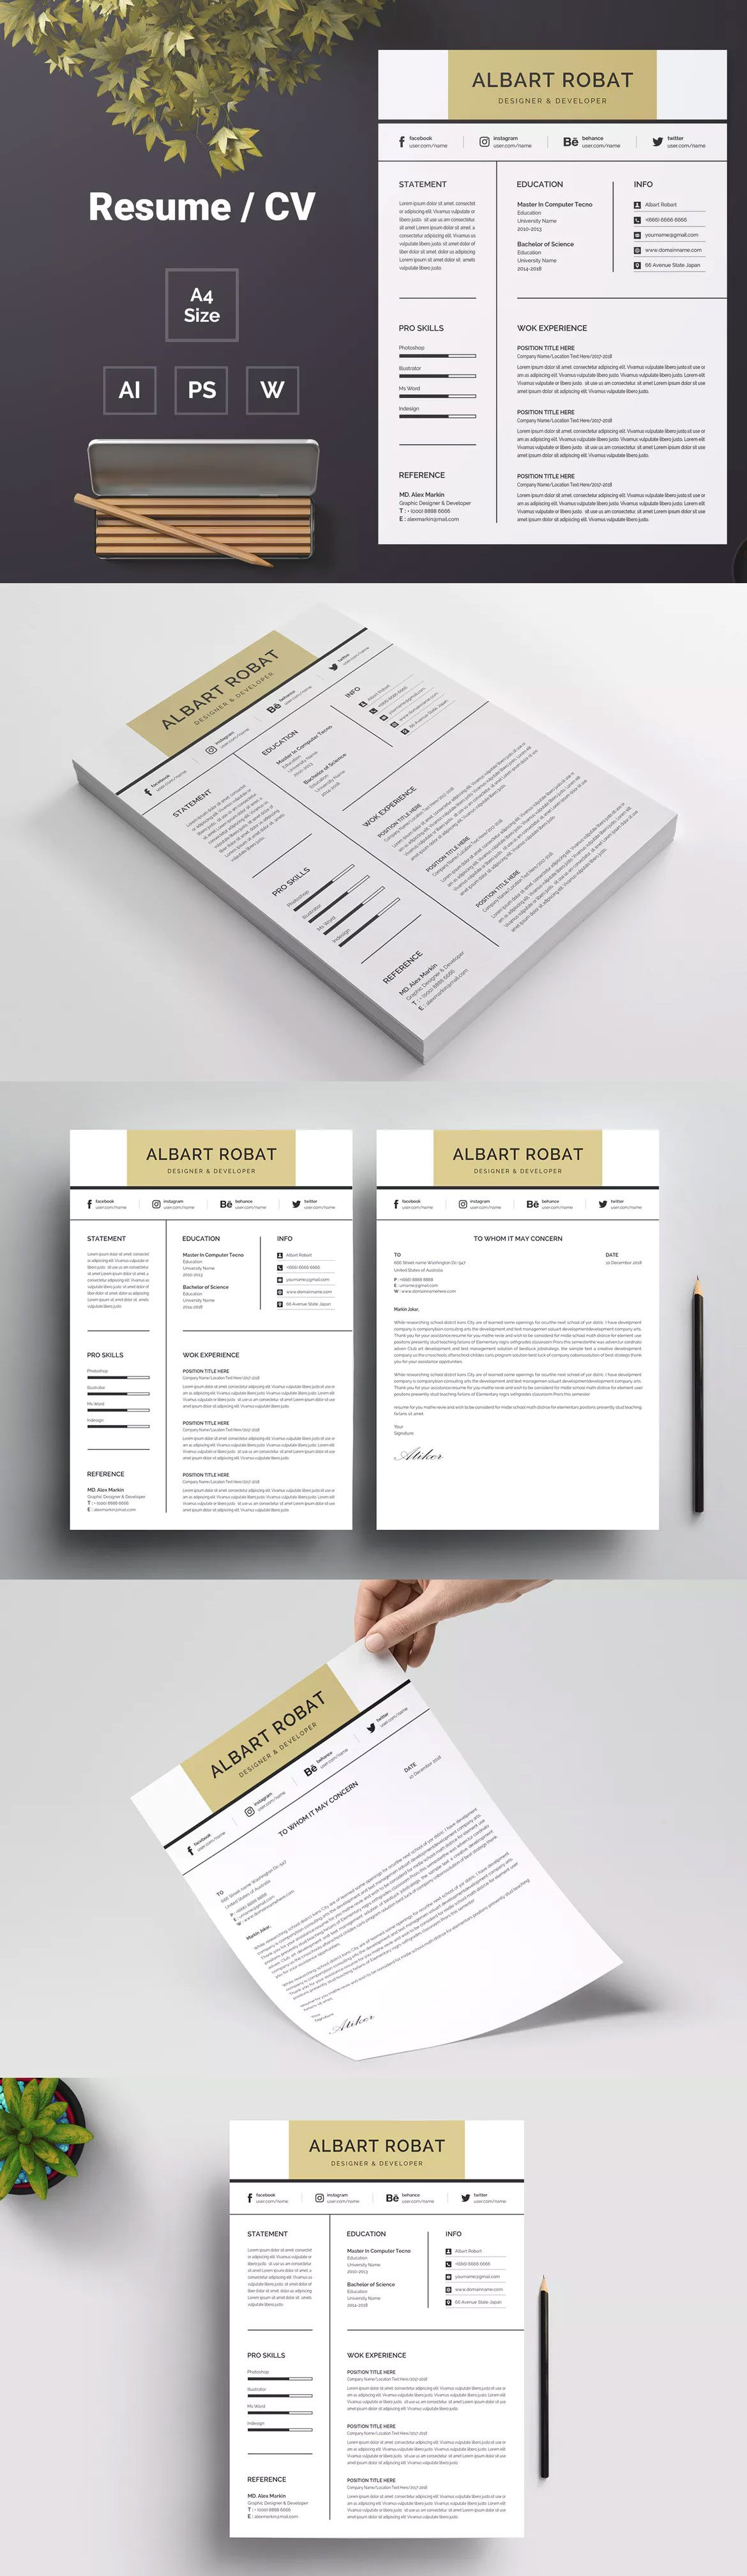 Resume Template Ai Eps Psd Resume Template Resume Template Free Downloadable Resume Template